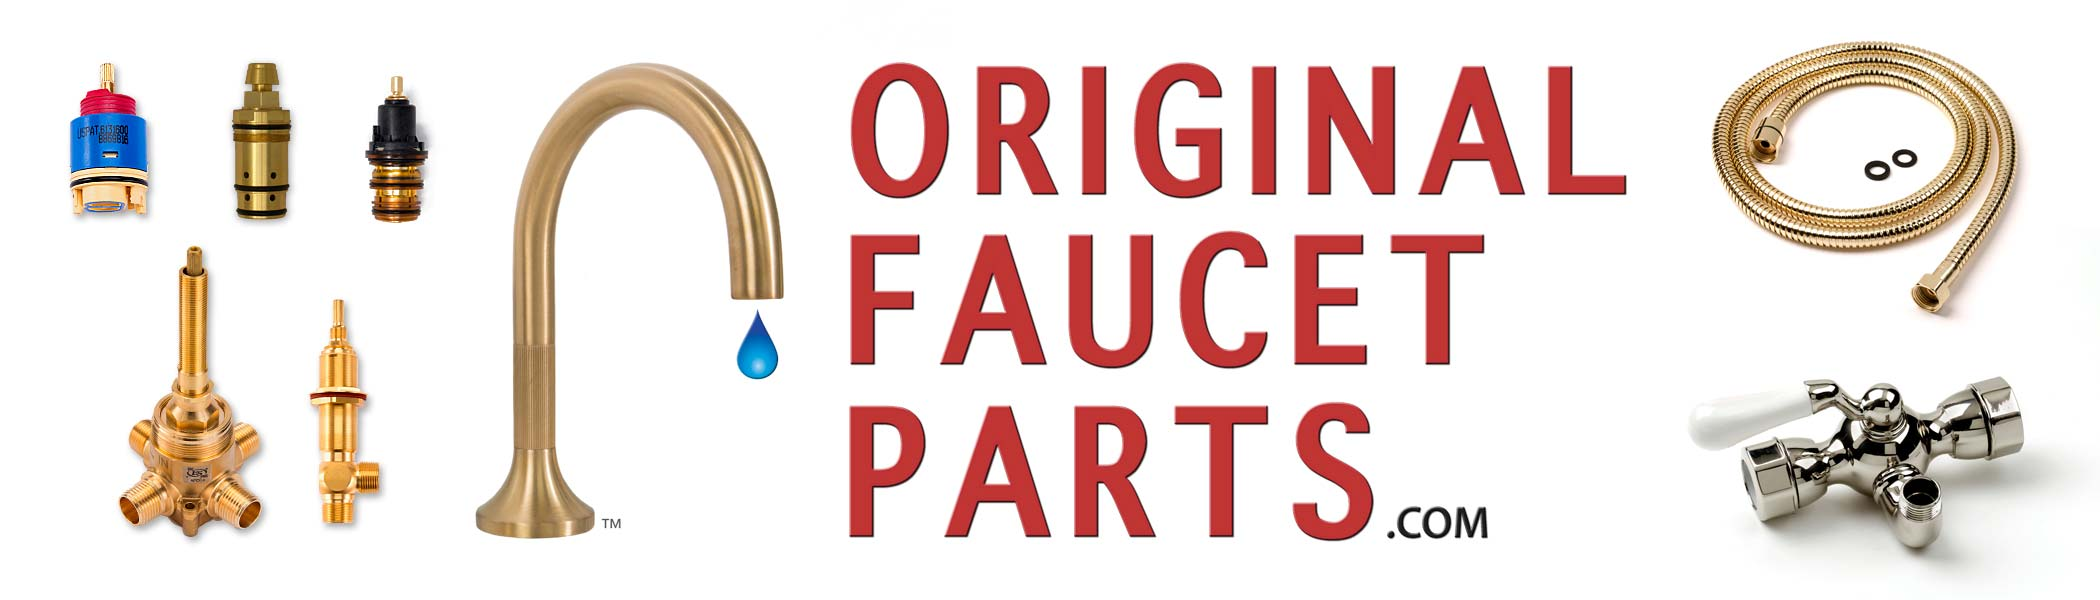 original-faucet-parts.jpg